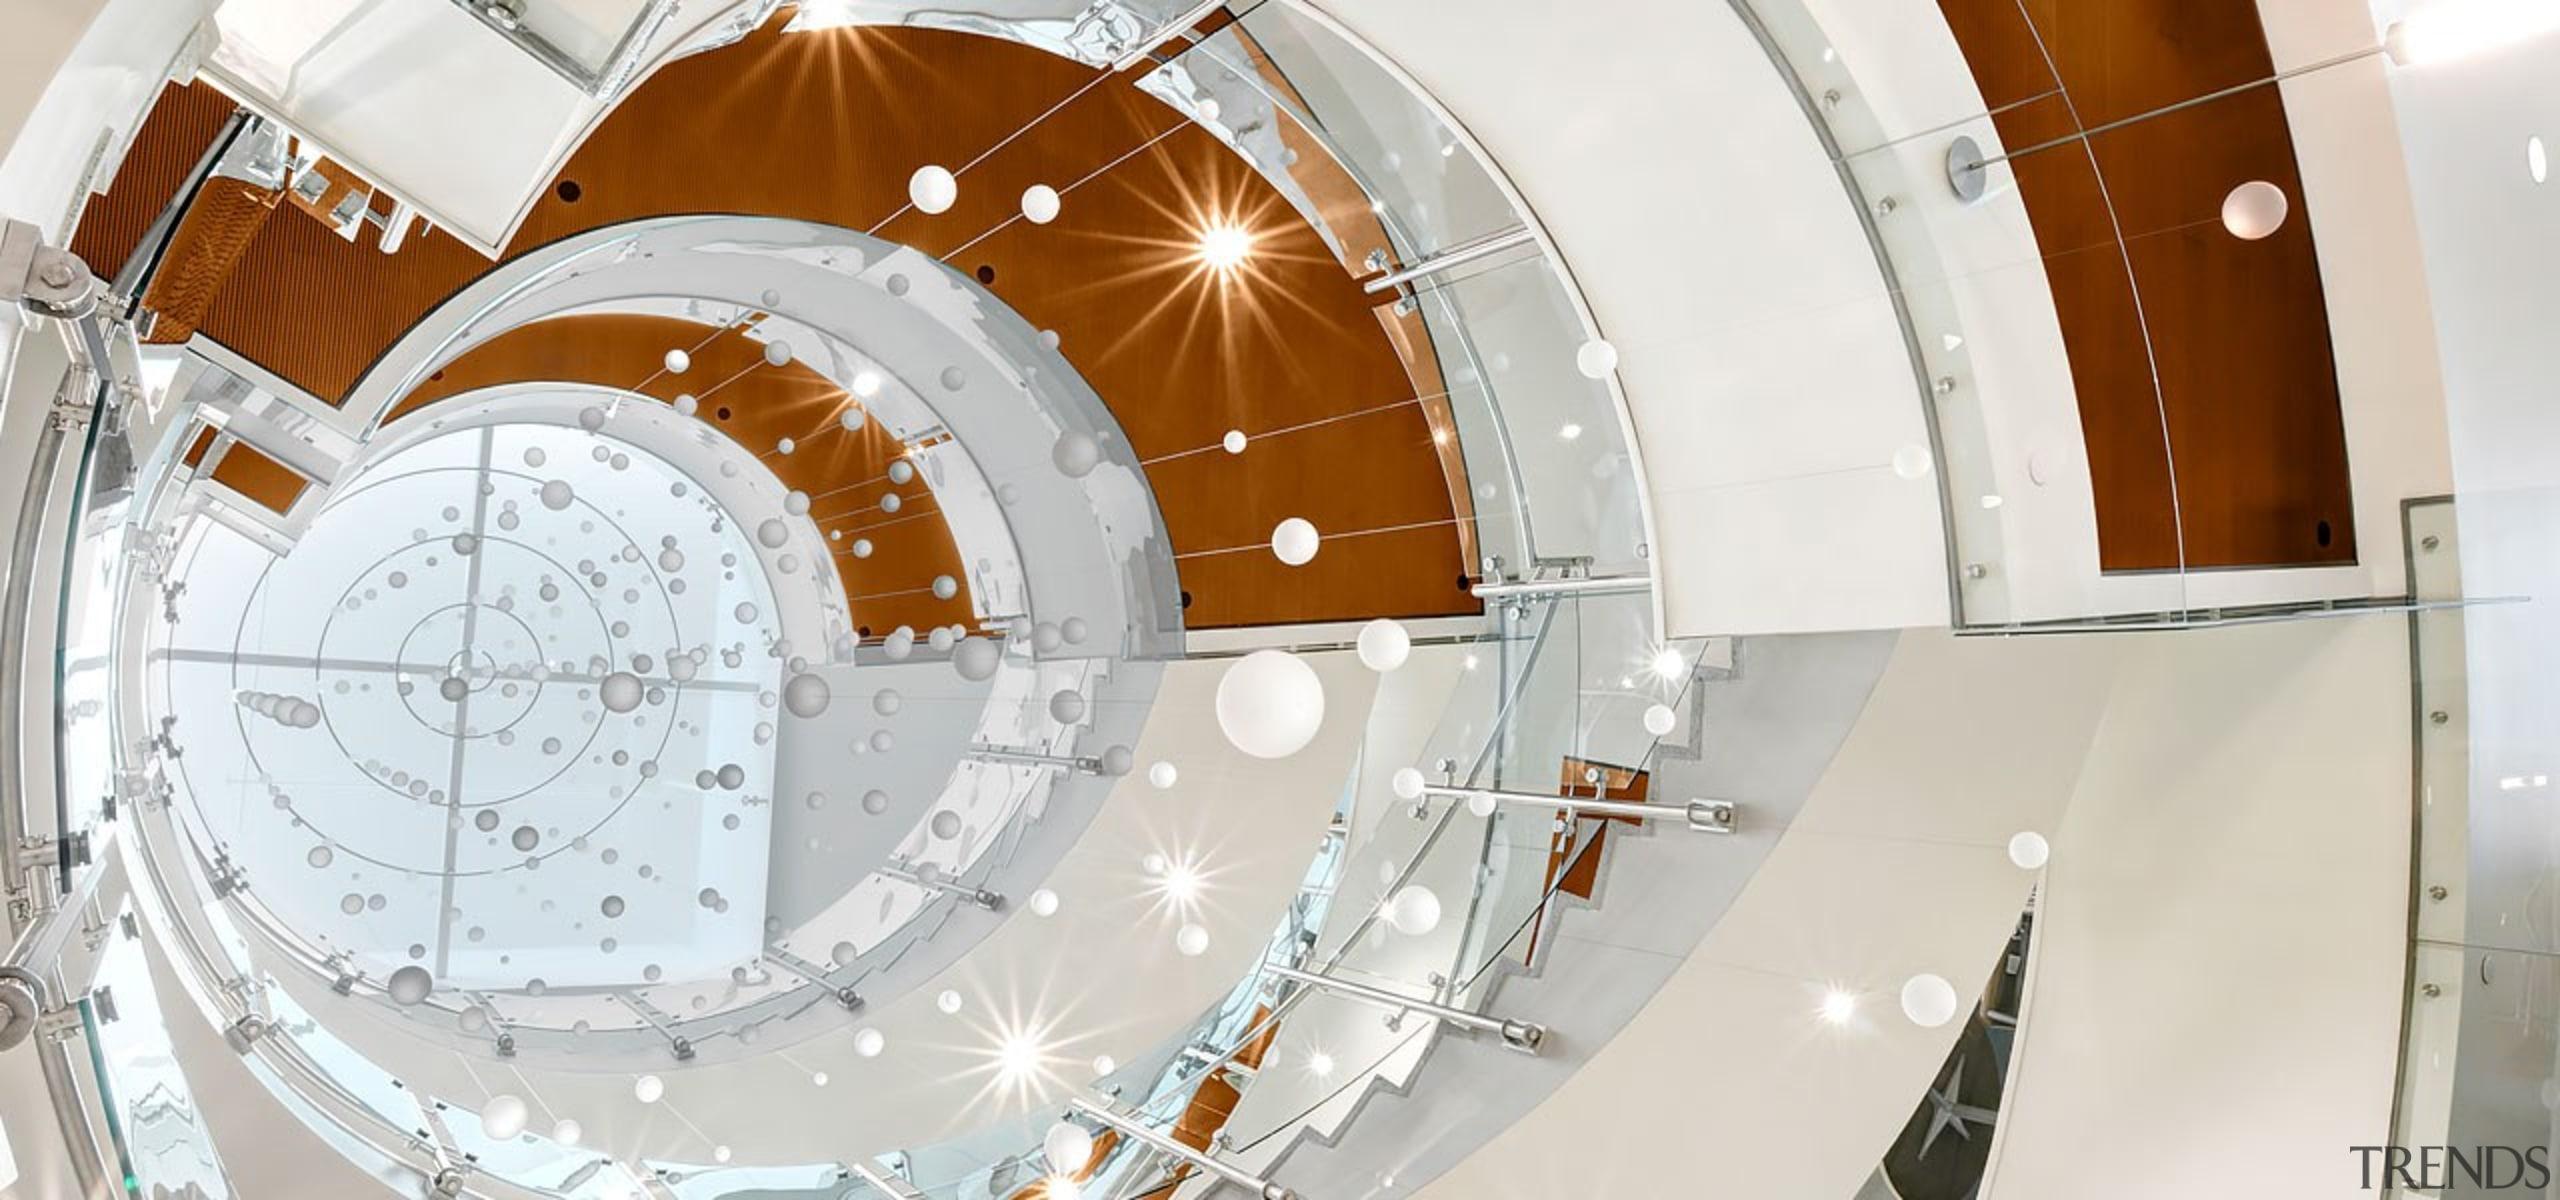 Colorado State University4 - architecture | ceiling | architecture, ceiling, circle, daylighting, space, stairs, white